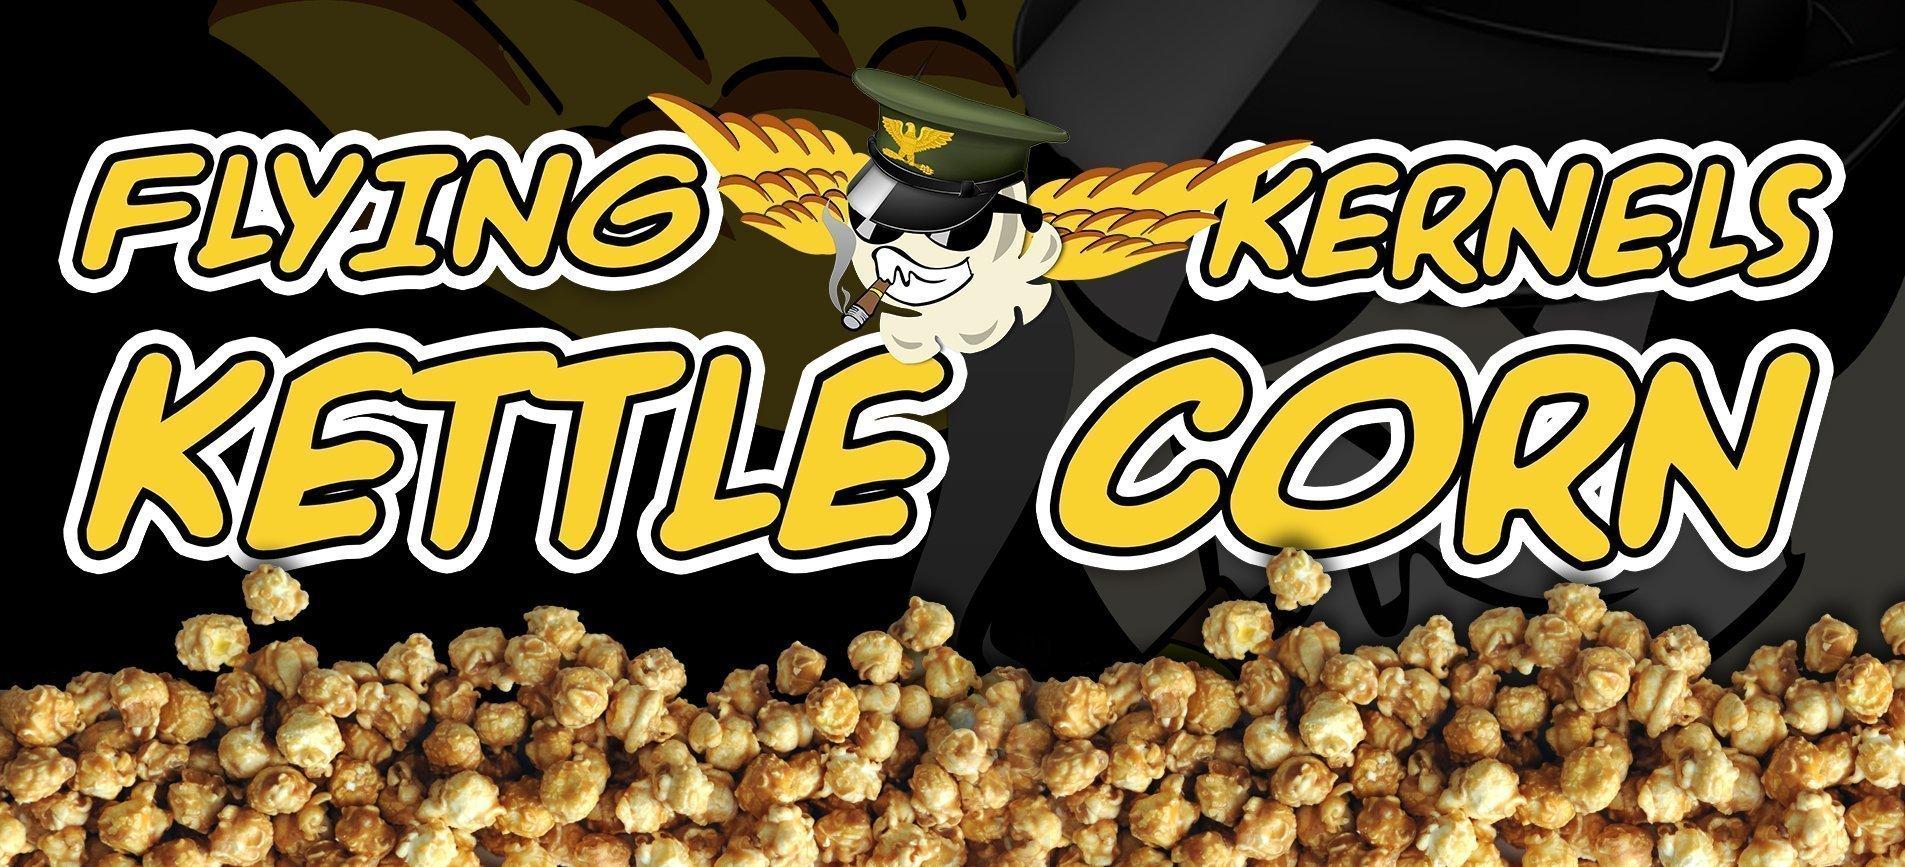 slider - flying kernels logo